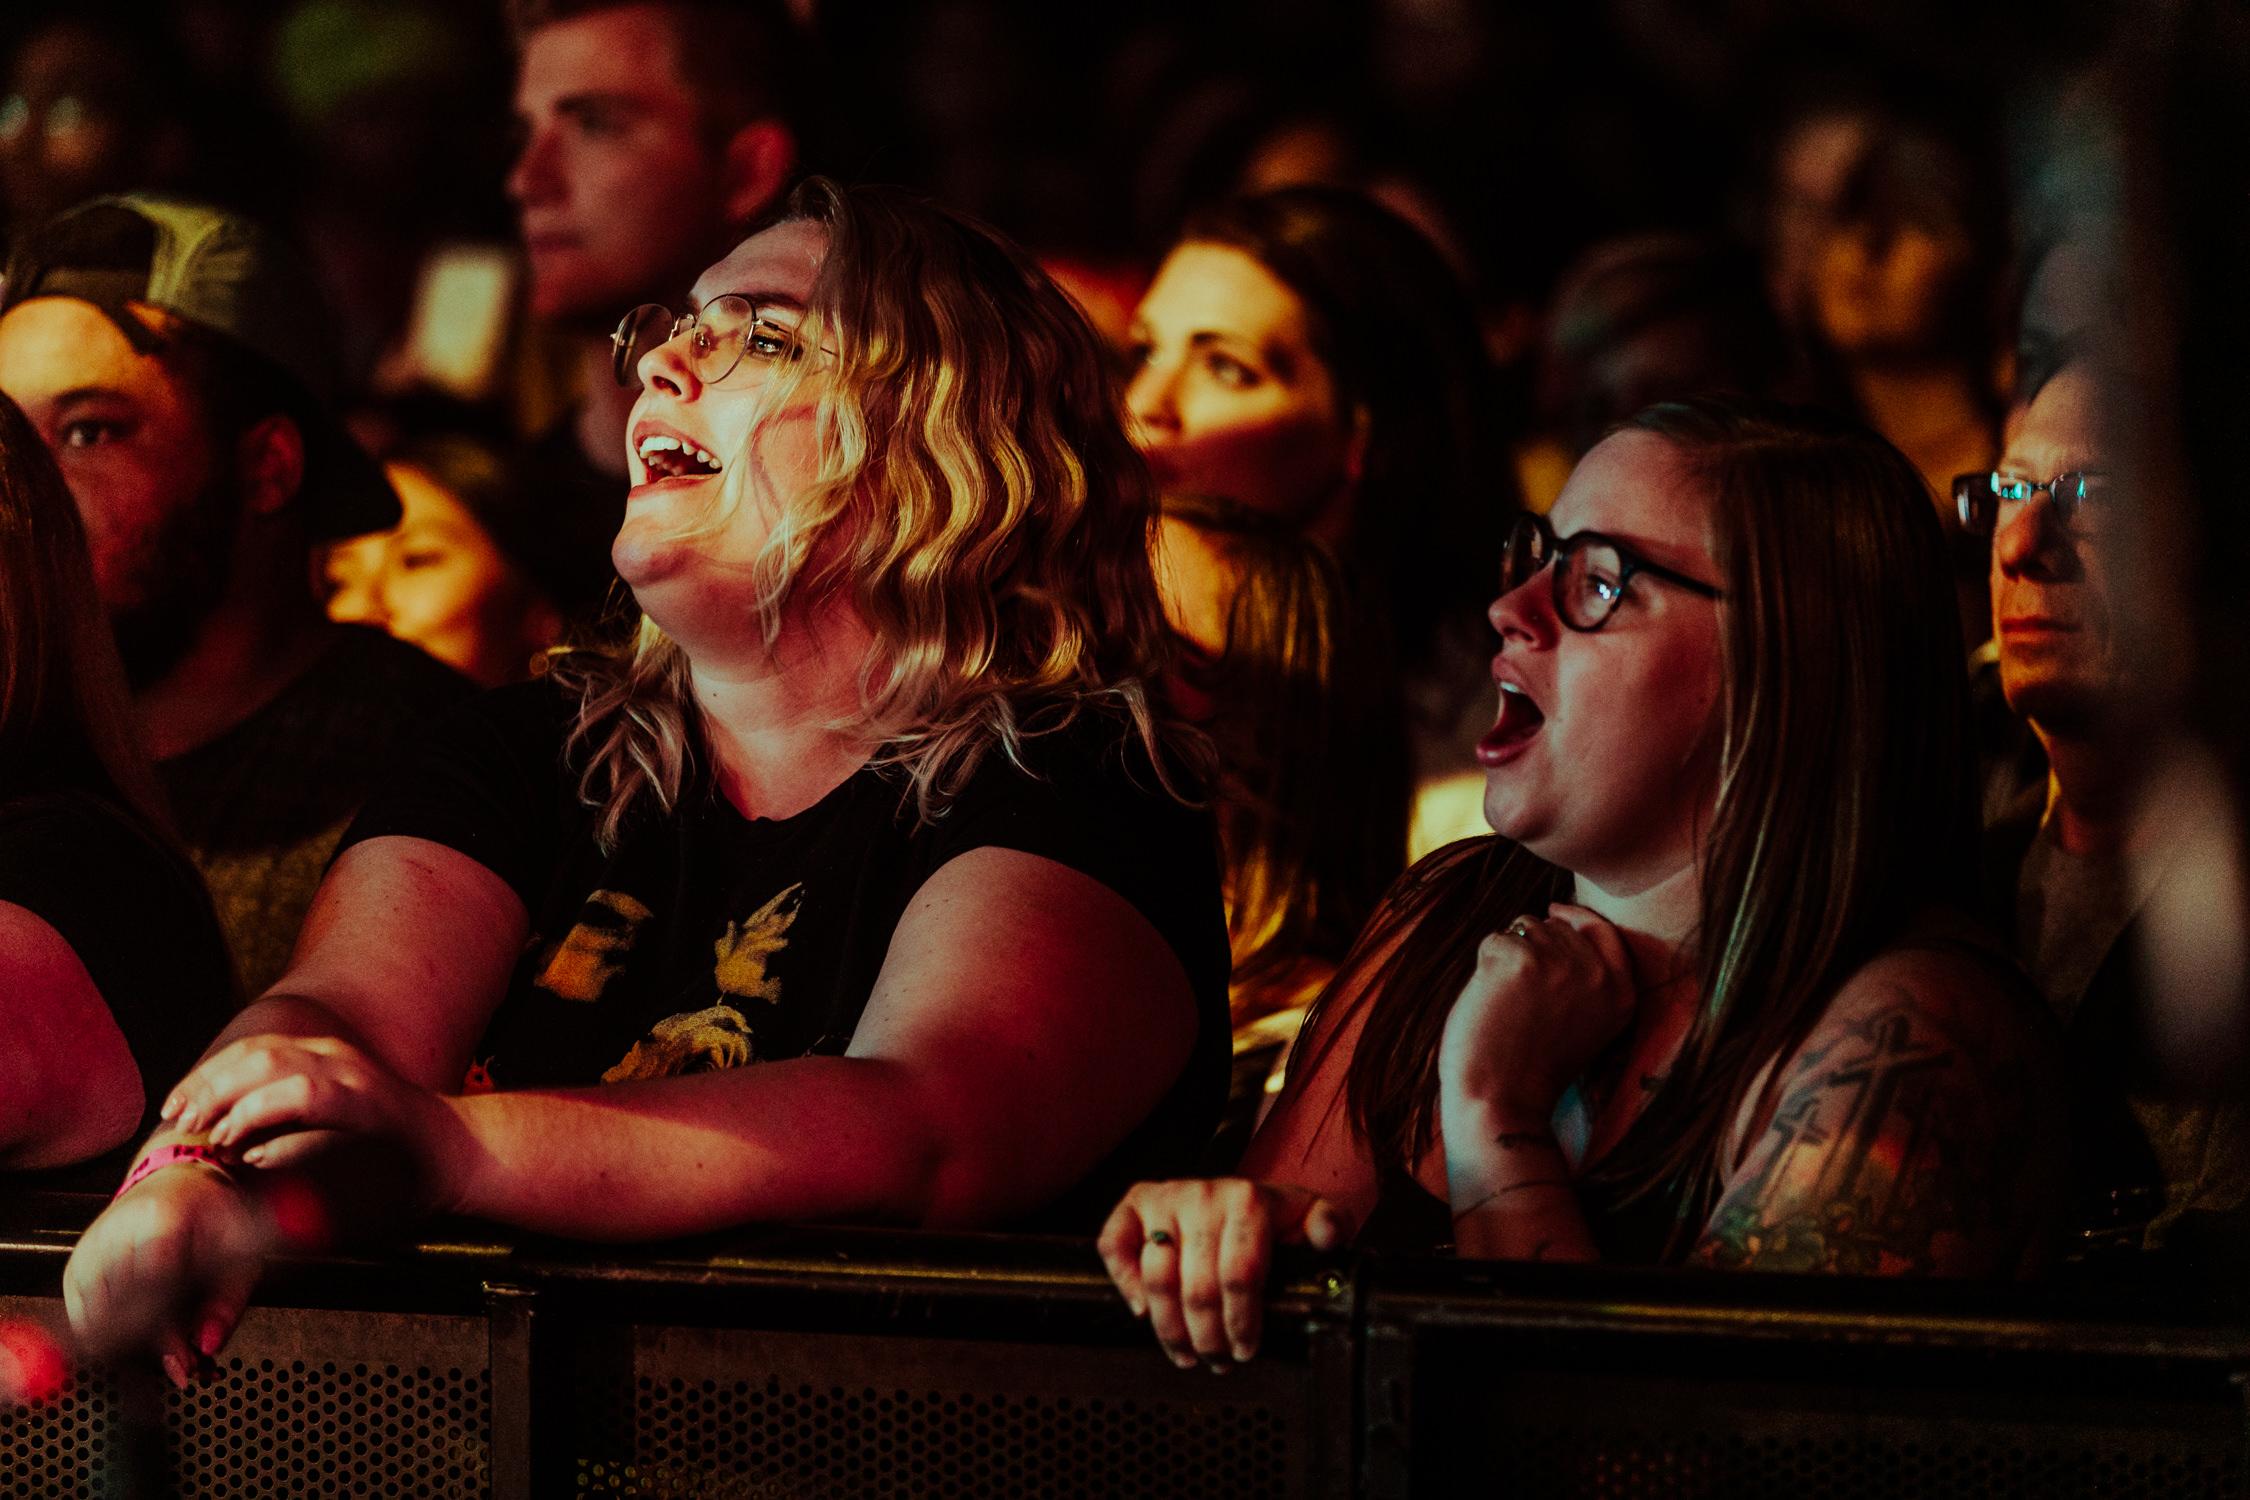 concert-front-row-fans-singing-AnnaLeeMedia